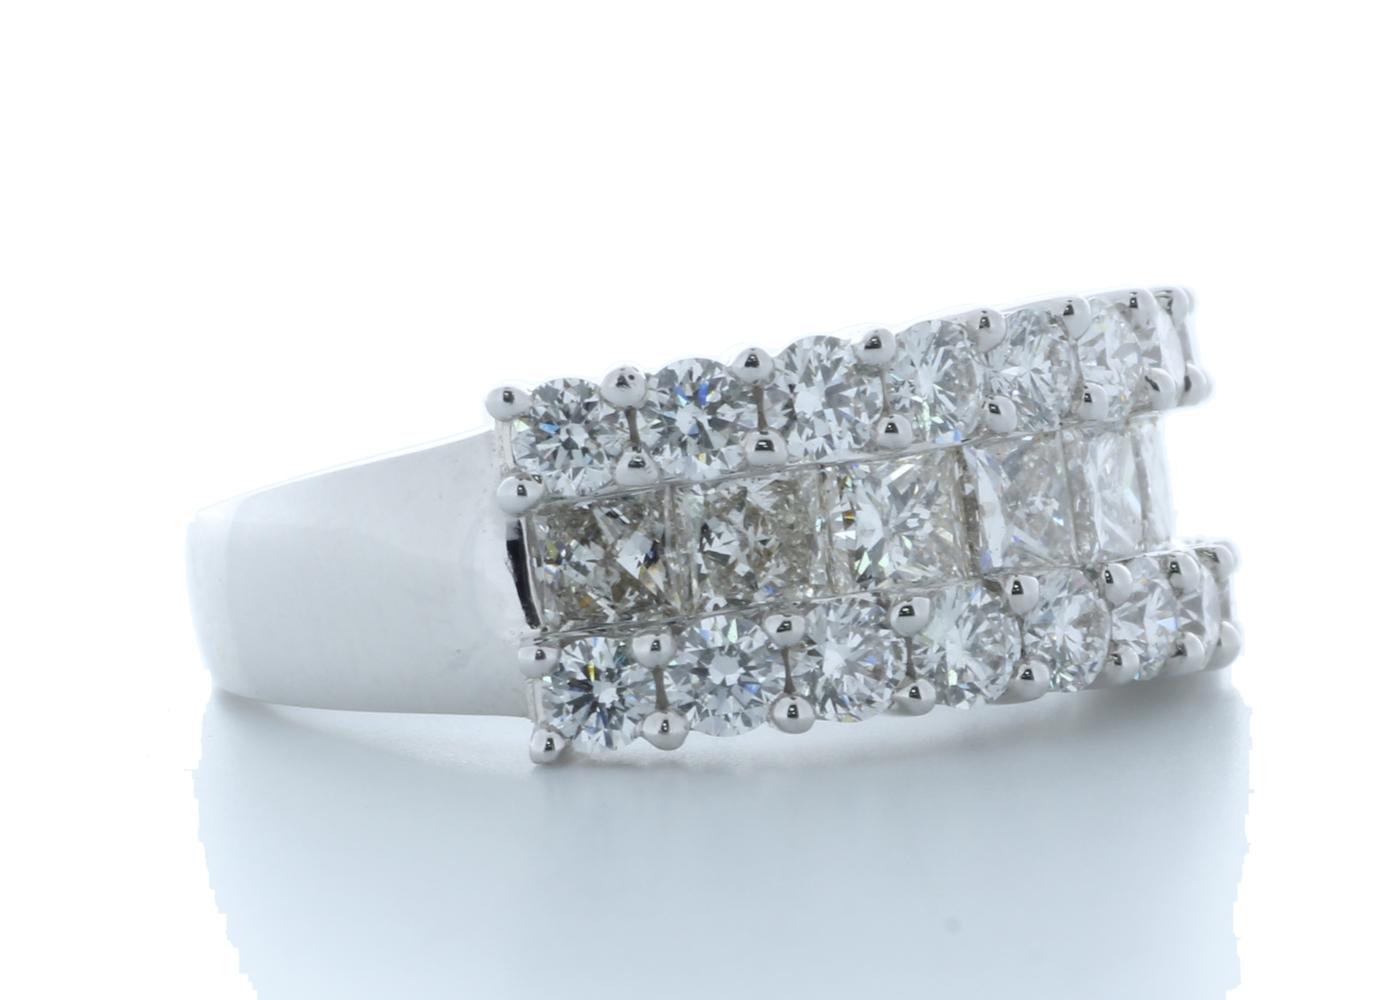 18k White Gold Claw Set Semi Eternity Diamond Ring 2.43 Carats - Image 4 of 4